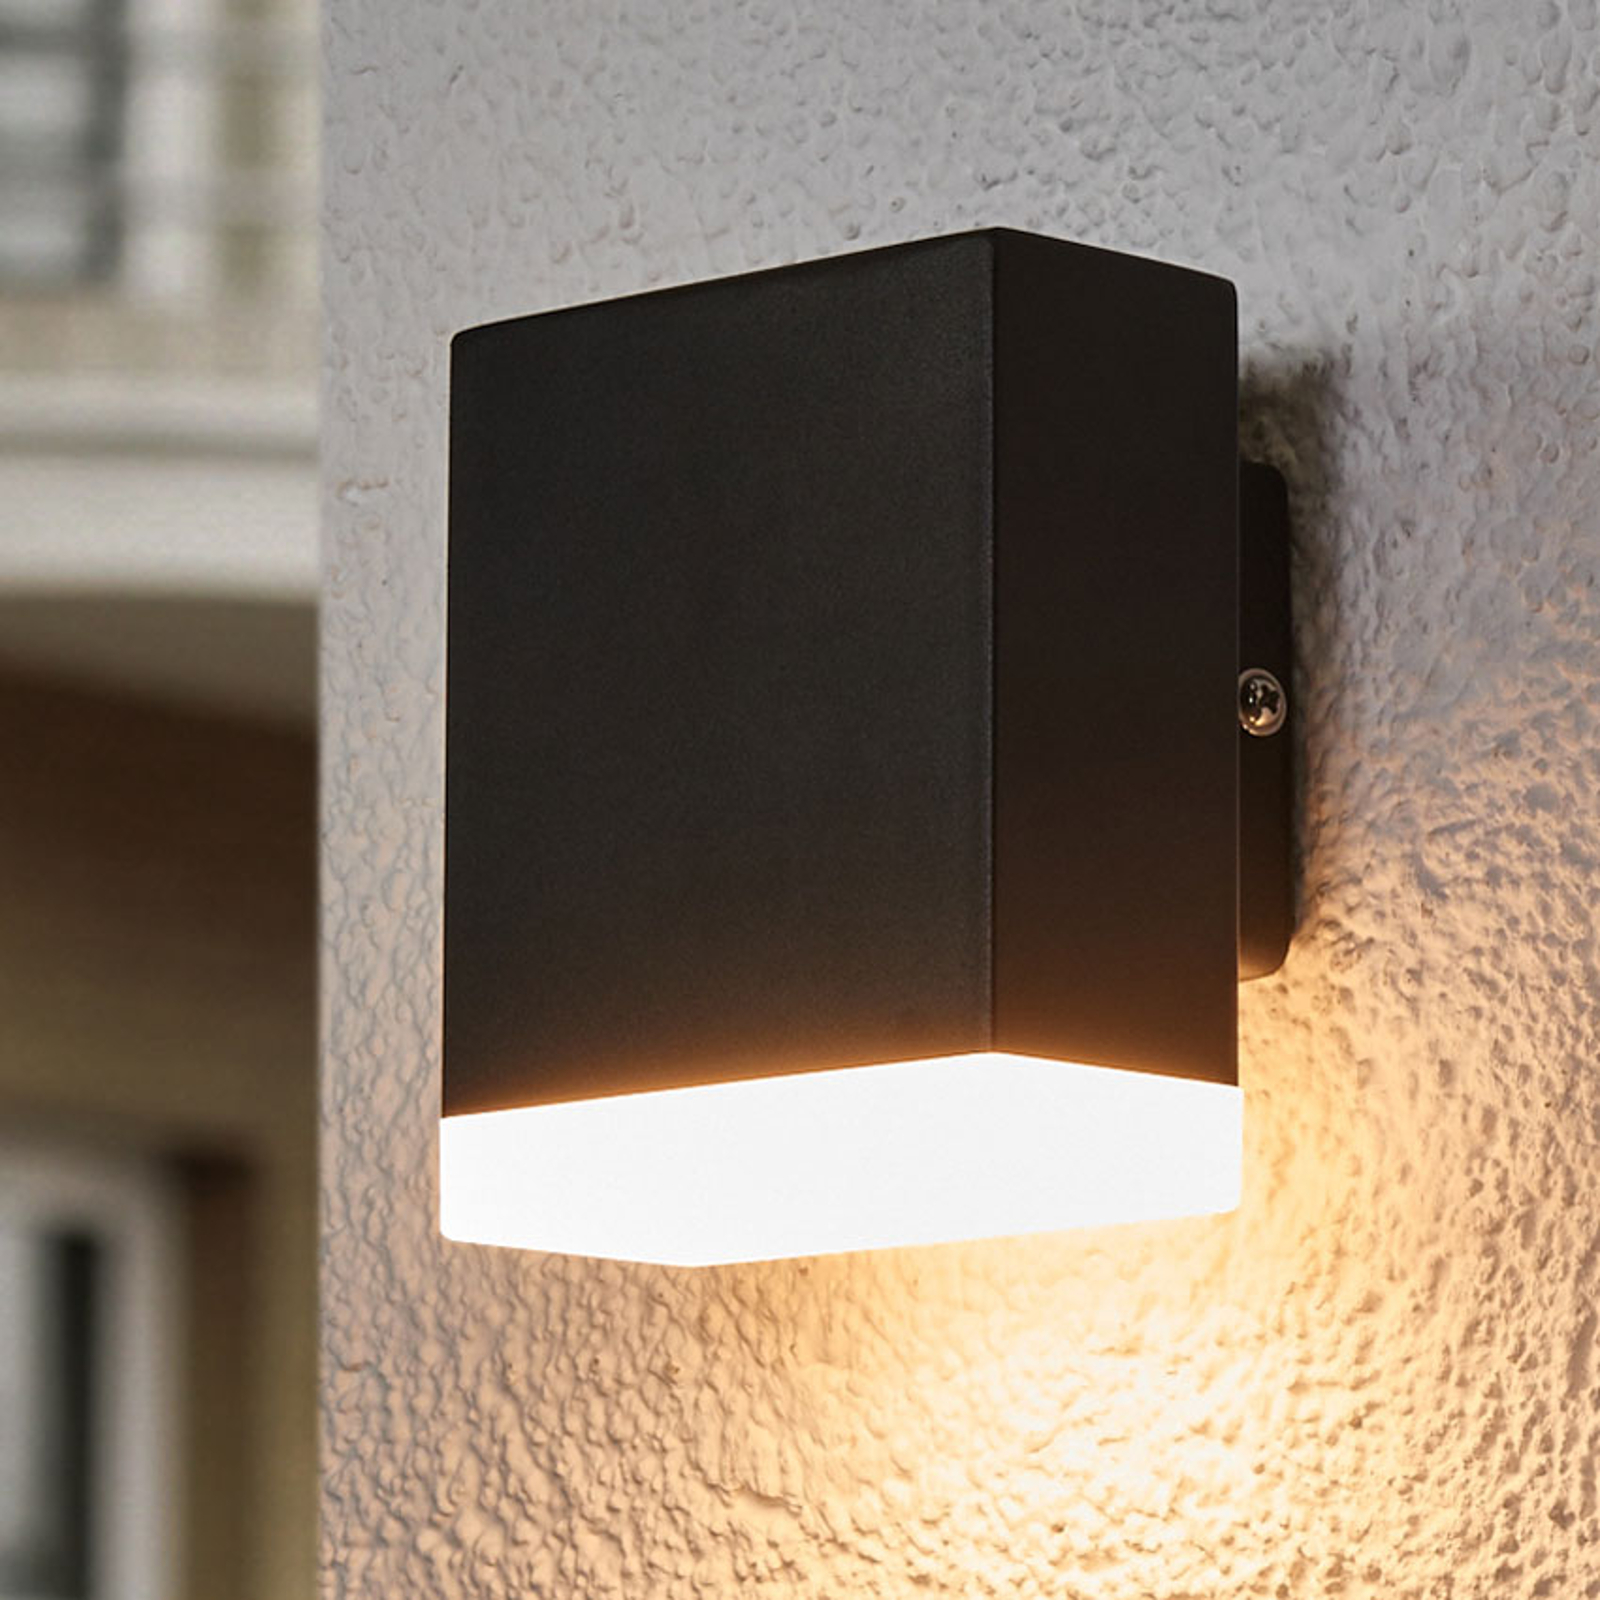 Moderne LED-Außenwandlampe Aya in Schwarz